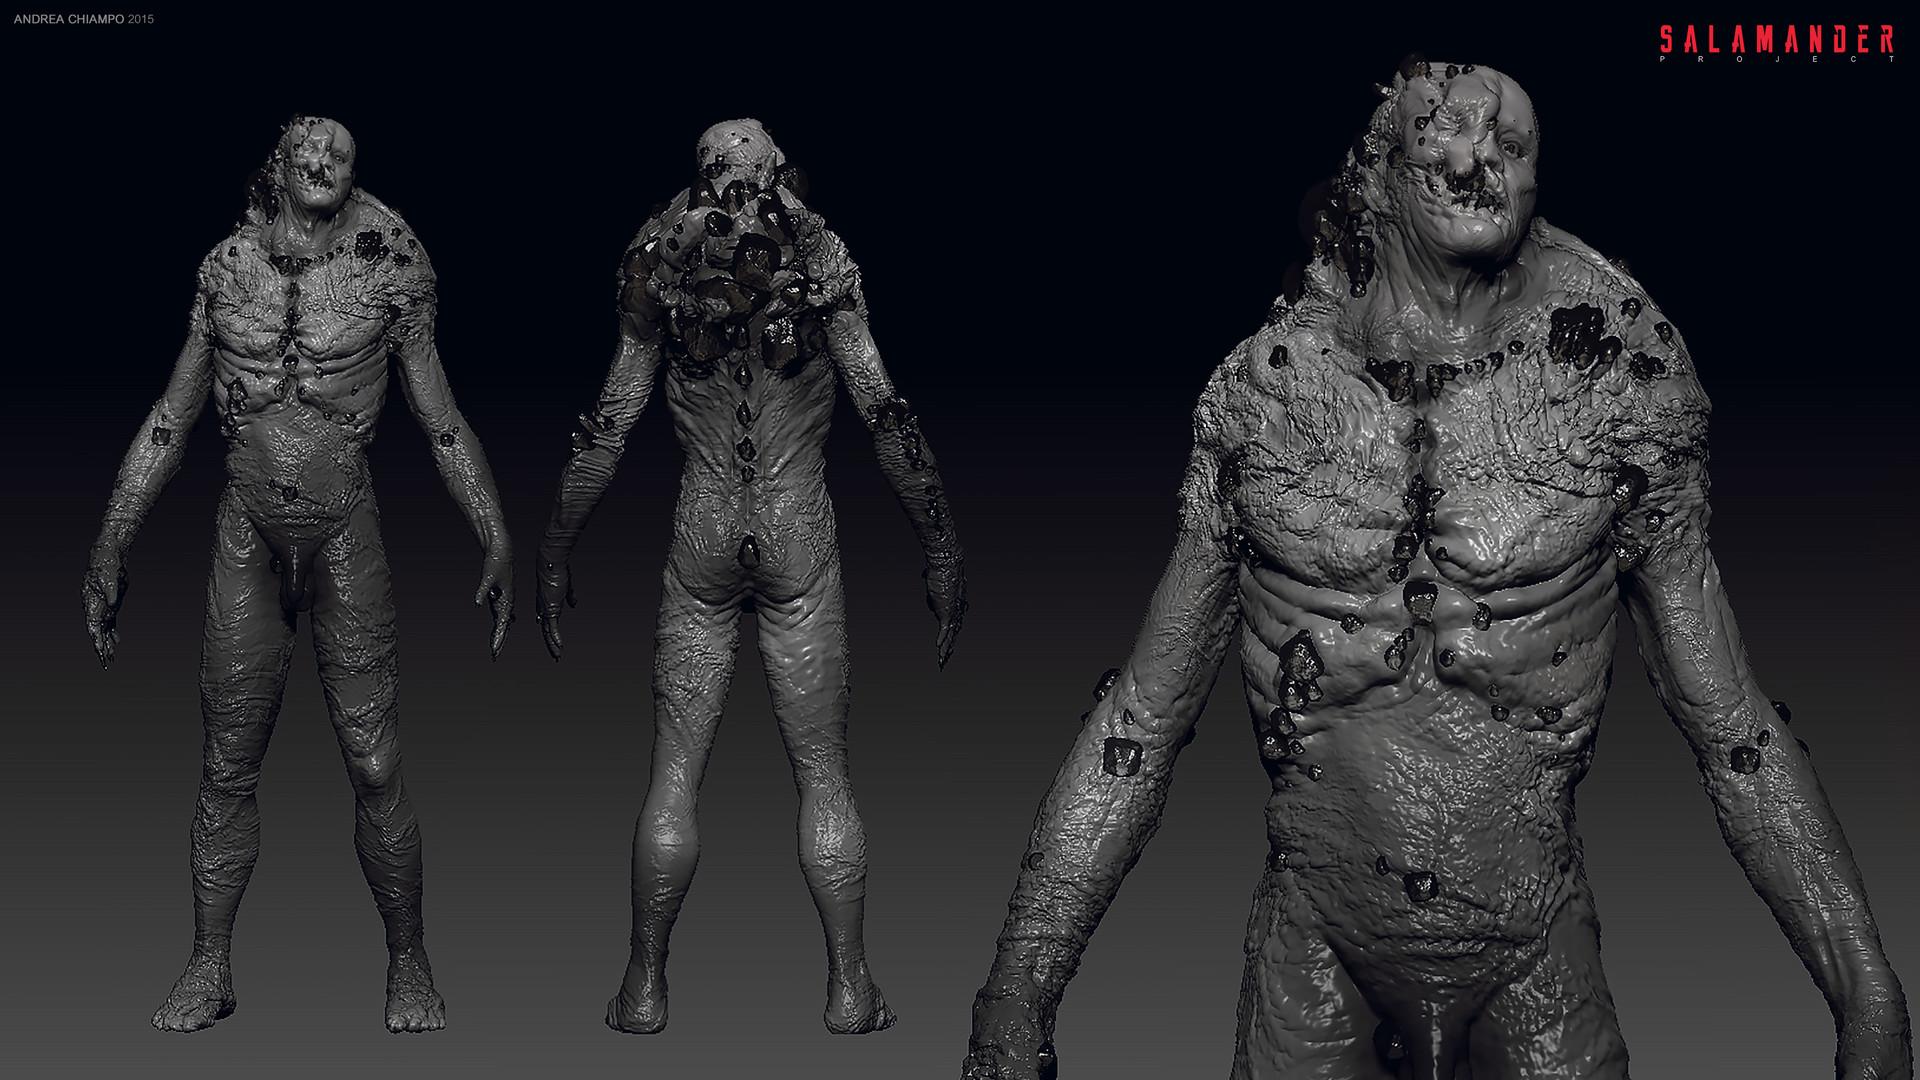 ArtStation - Human Mutant - early Concept Art for Salamander